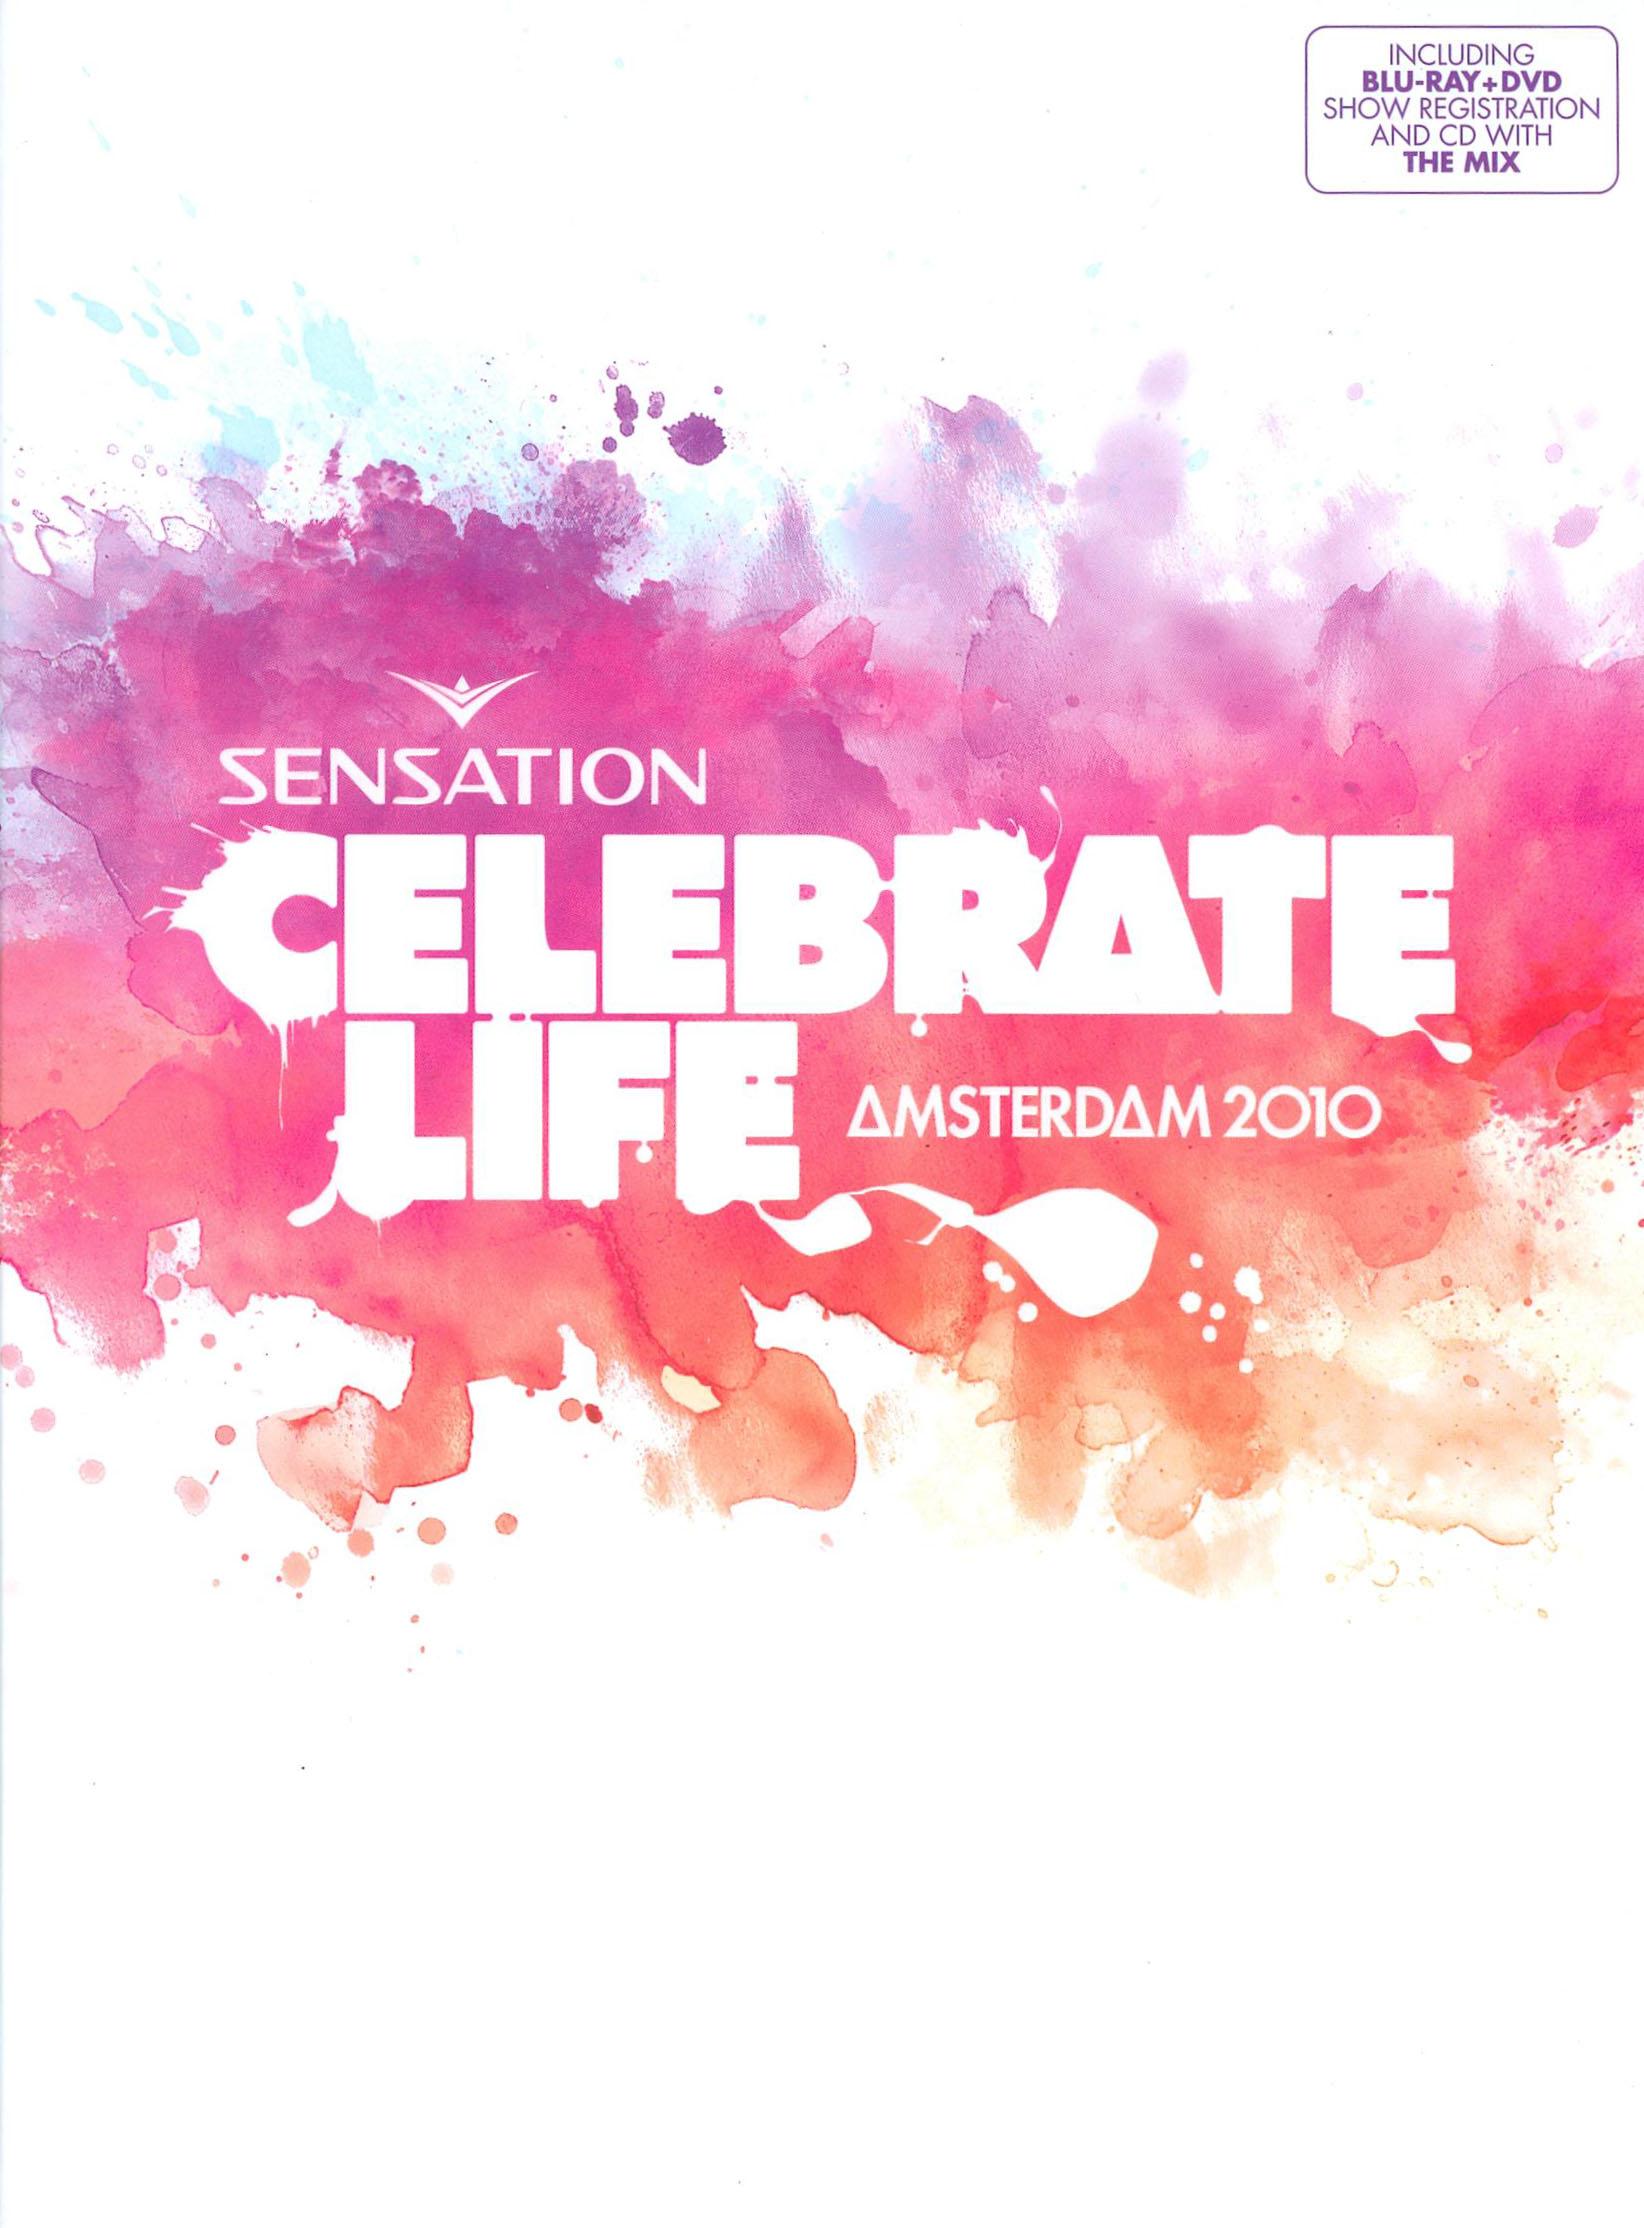 Sensation: Celebrate Life - Amsterdam 2010